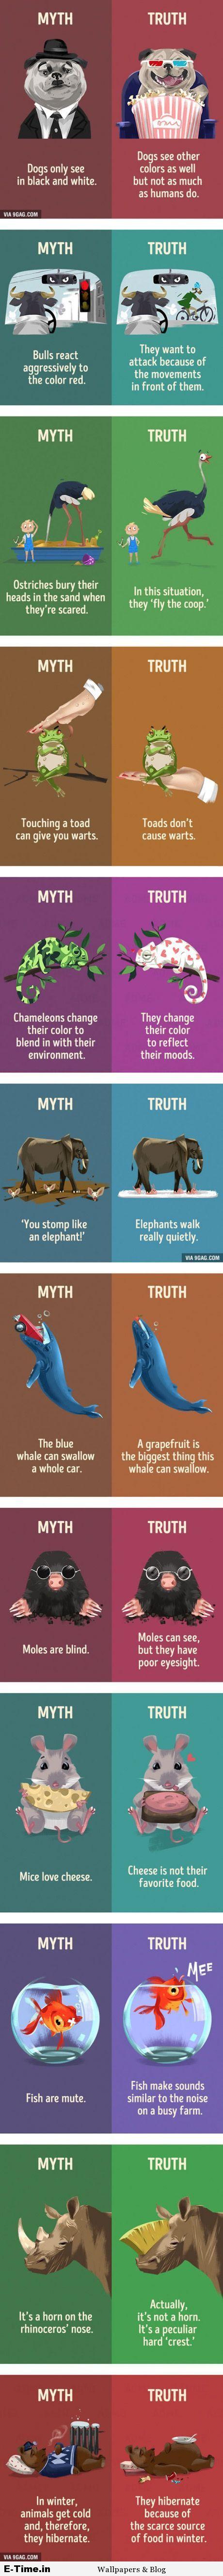 12 Myths About Animals That We Still Believe